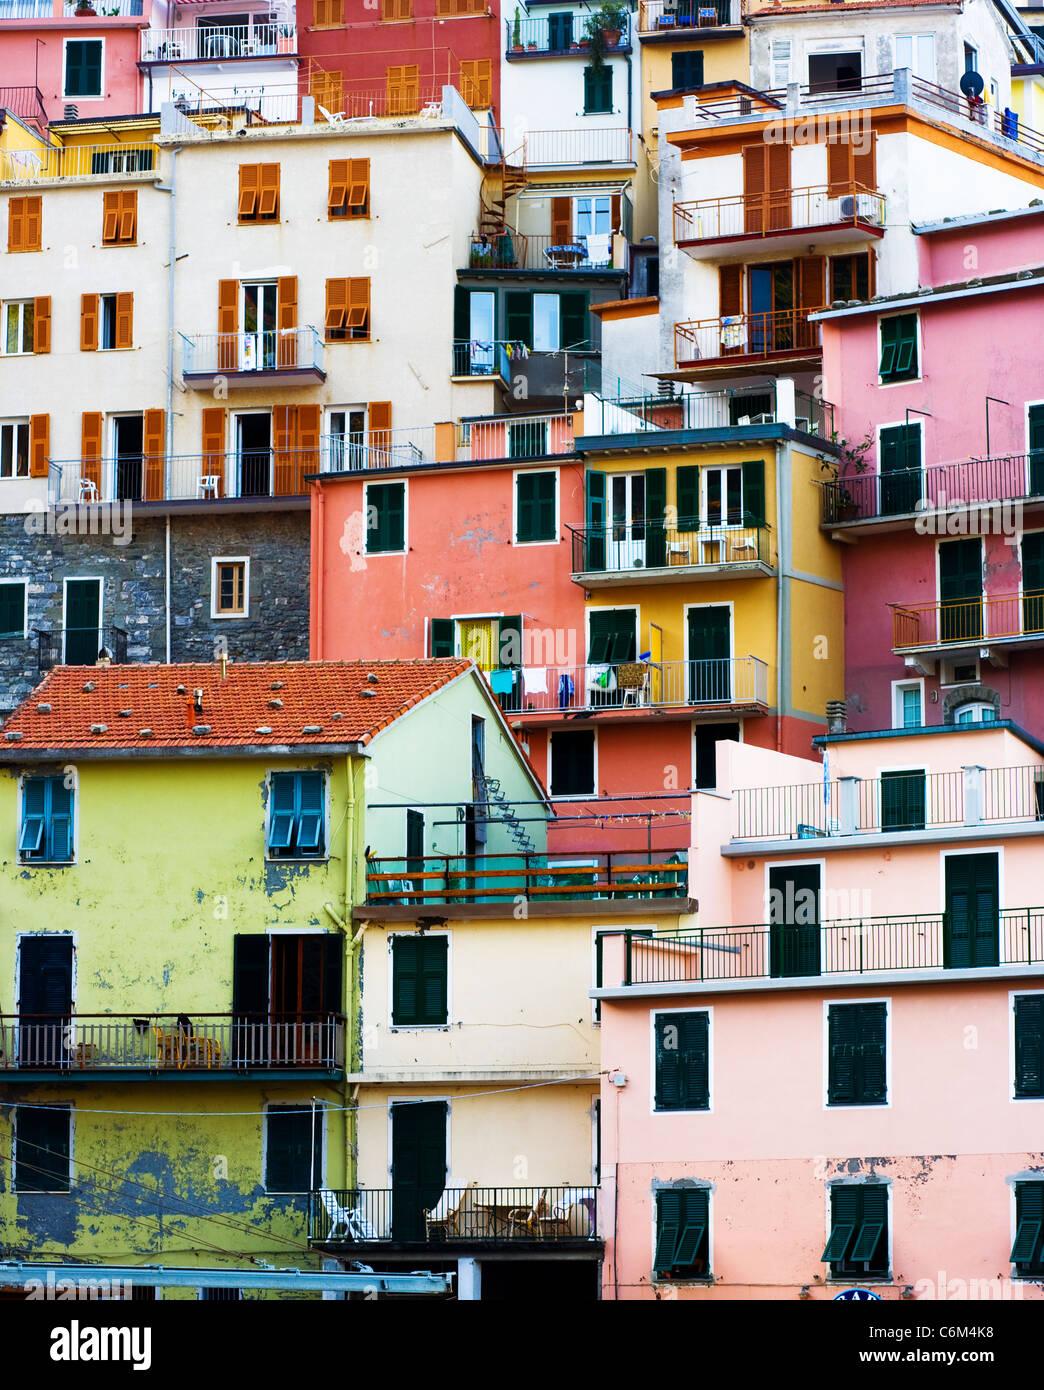 Bunte Gebäude in Cinque Terre, Italien. Stockbild